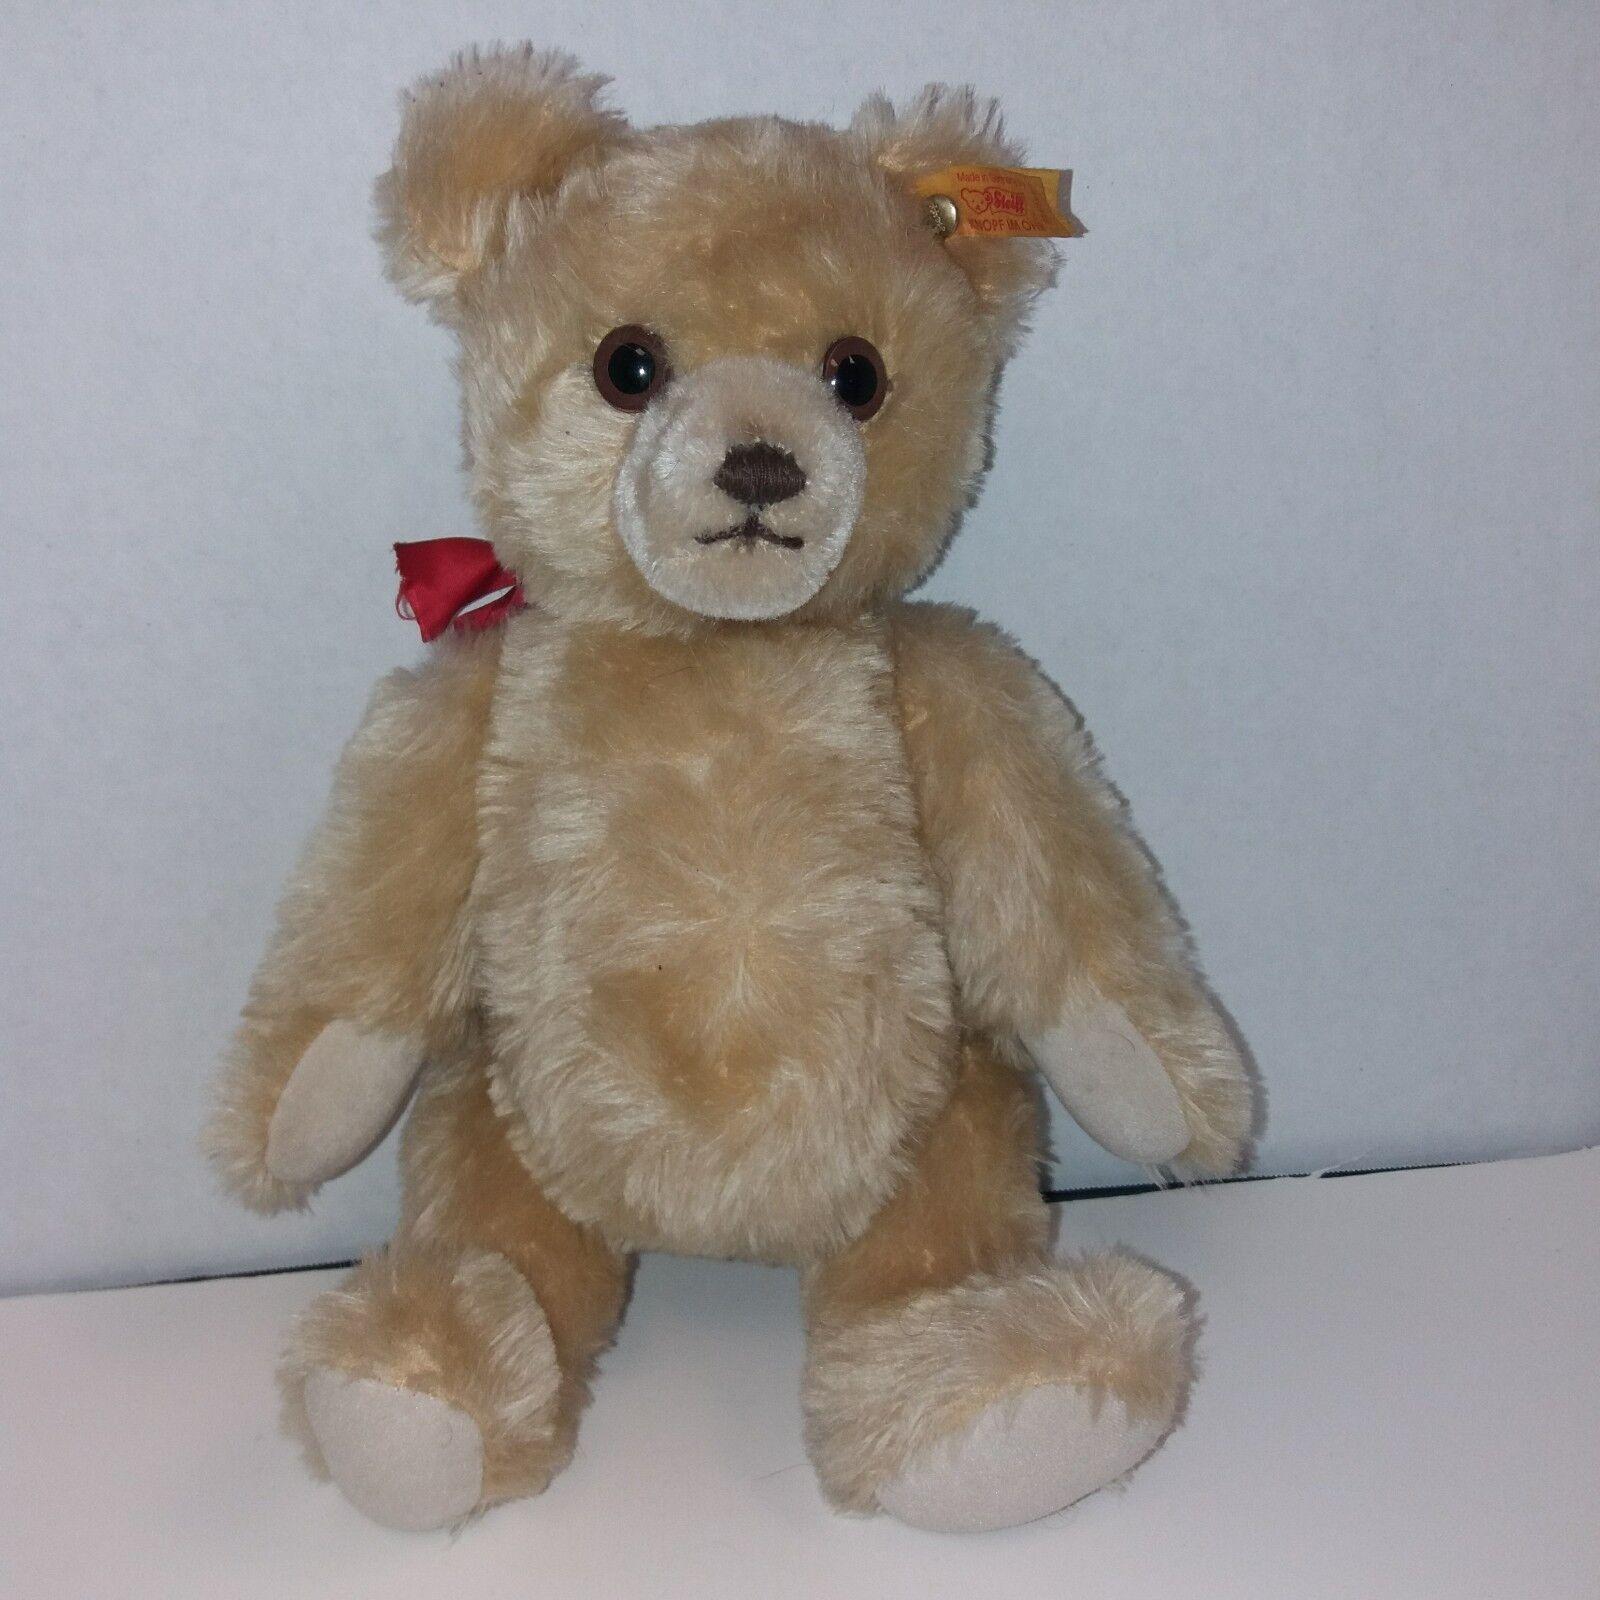 Vintage Steiff Jointed Growler Teddy Bear Blonde 011757 Button & Ribbon 12